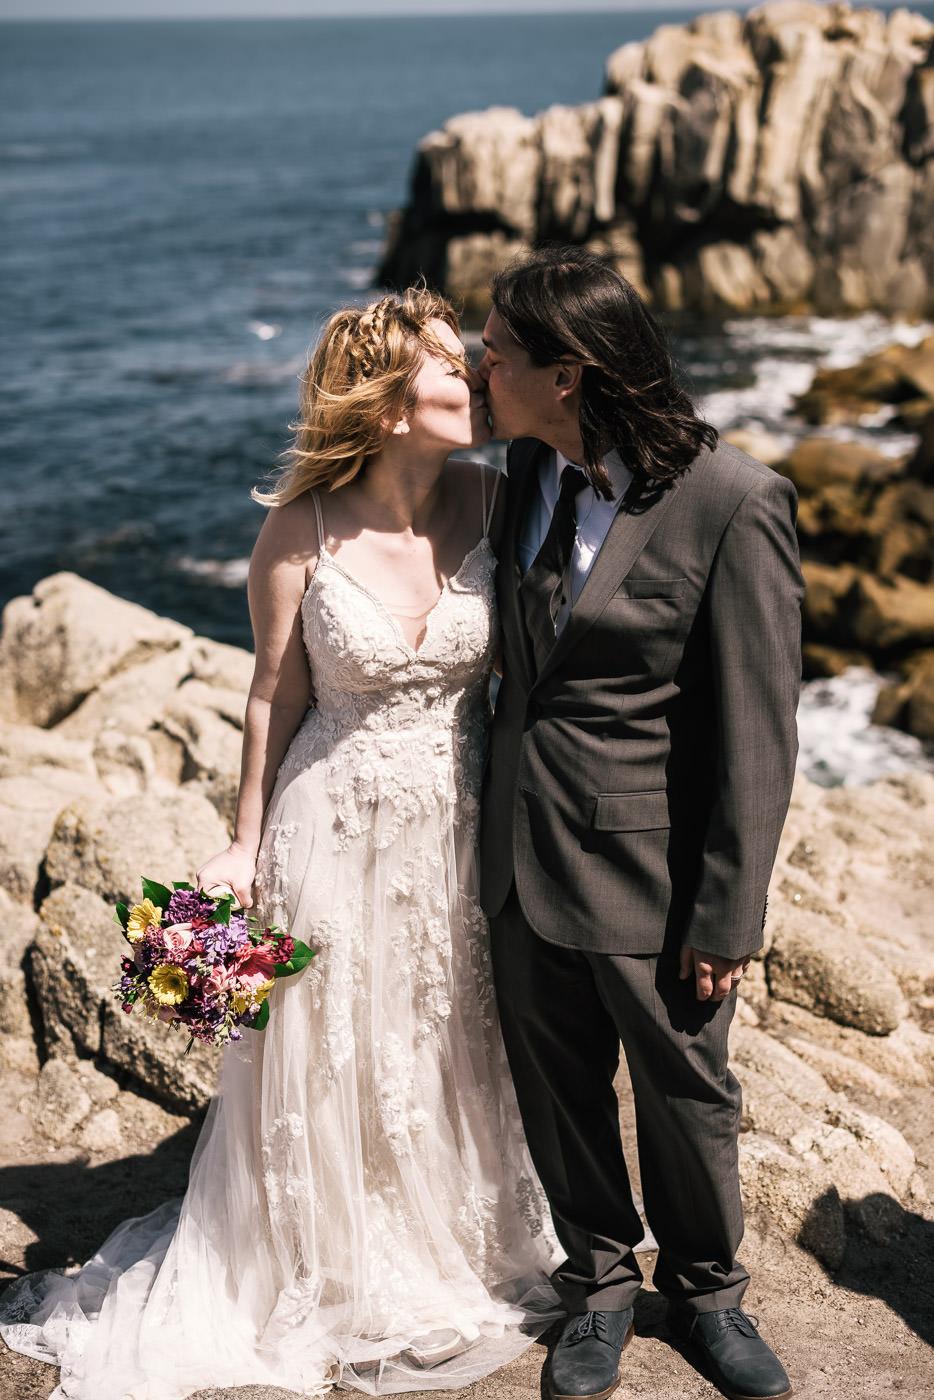 Romantic wedding photos on the Pacific coast.